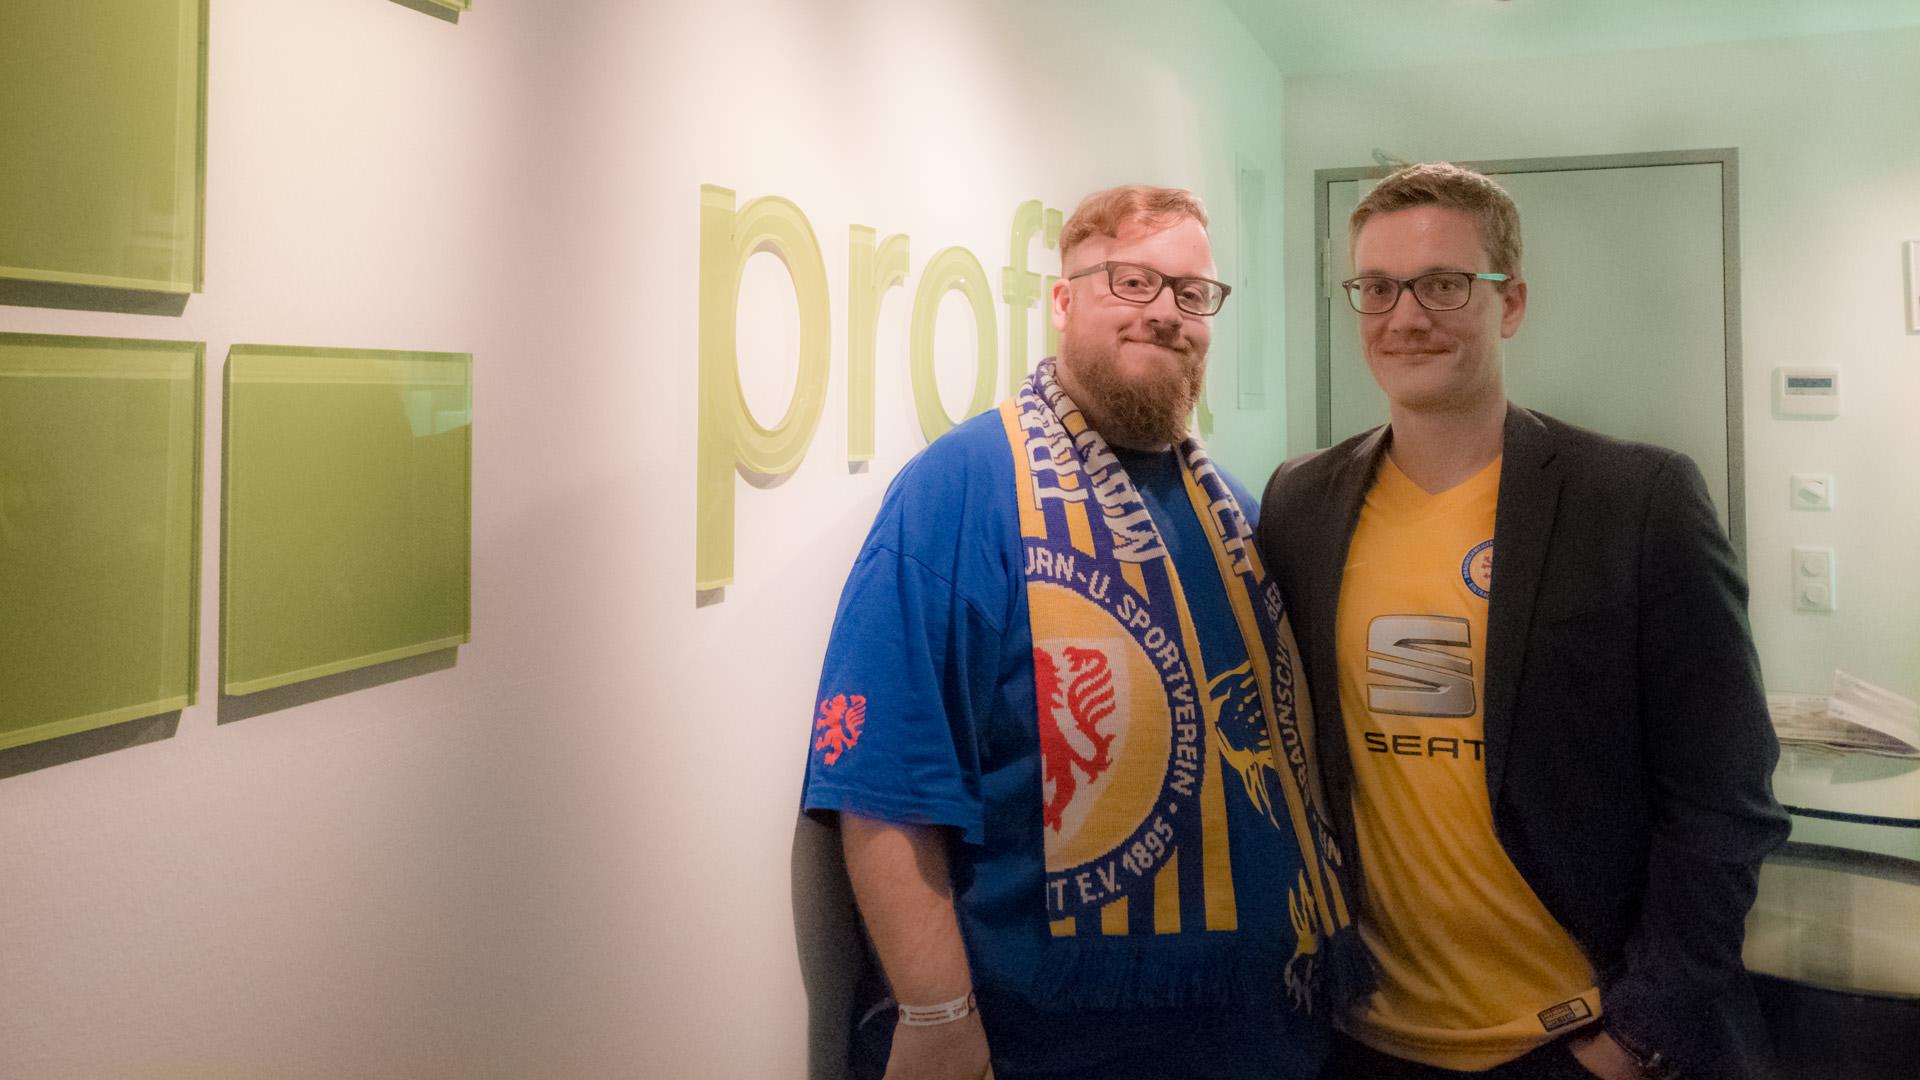 Profihost Kooperiert Mit Aktion100 Christian Vogt Mit Sebastian Bluhm In Der VIP Loge